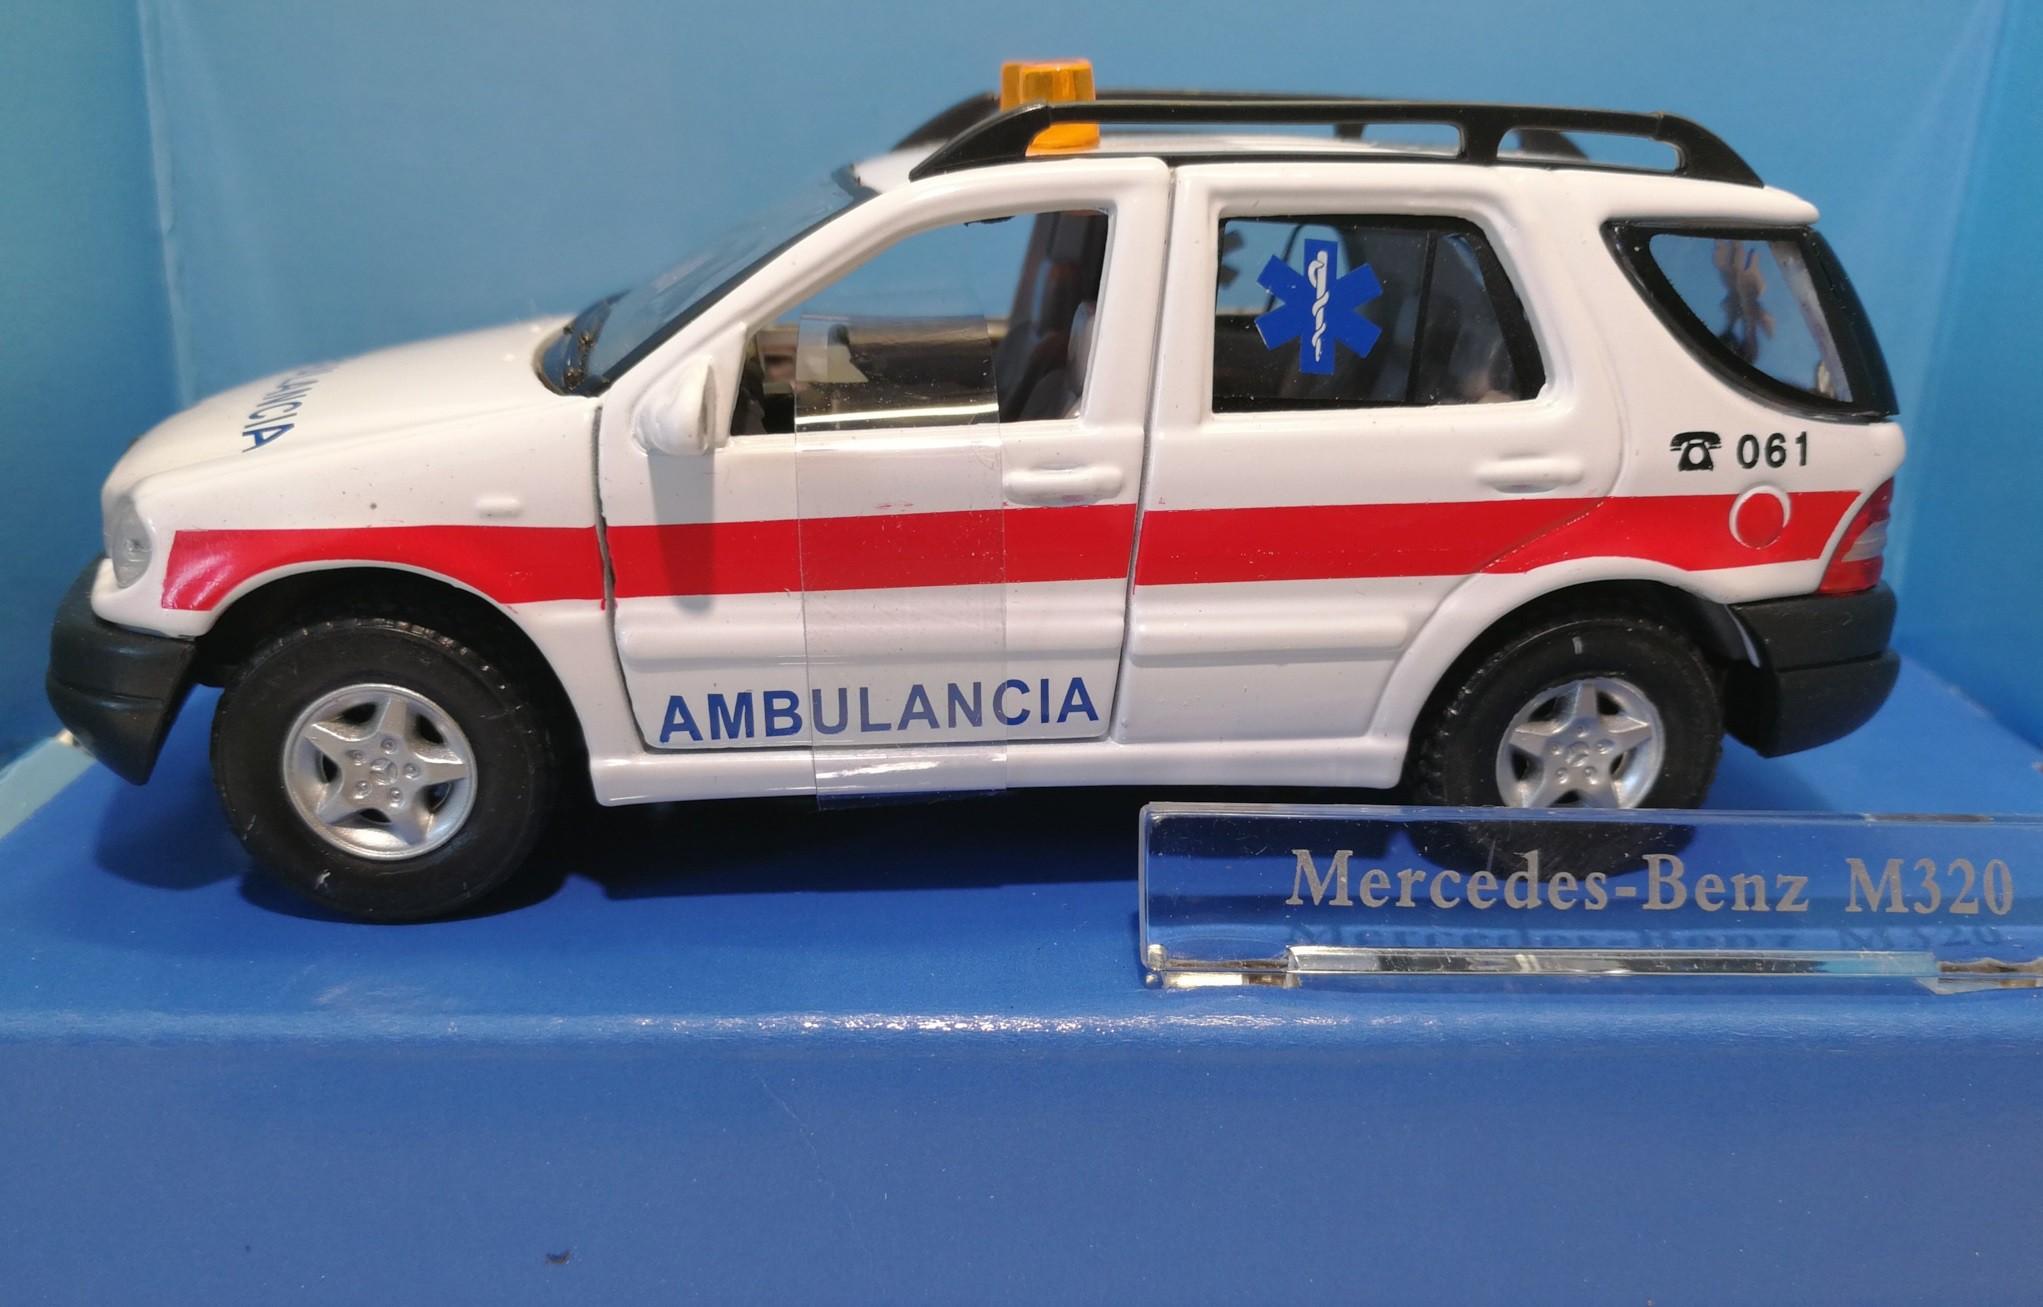 Mercedes Benz Ml320 Ambulance Rescue 061 Rettung Spanien M143 Hongwell 1